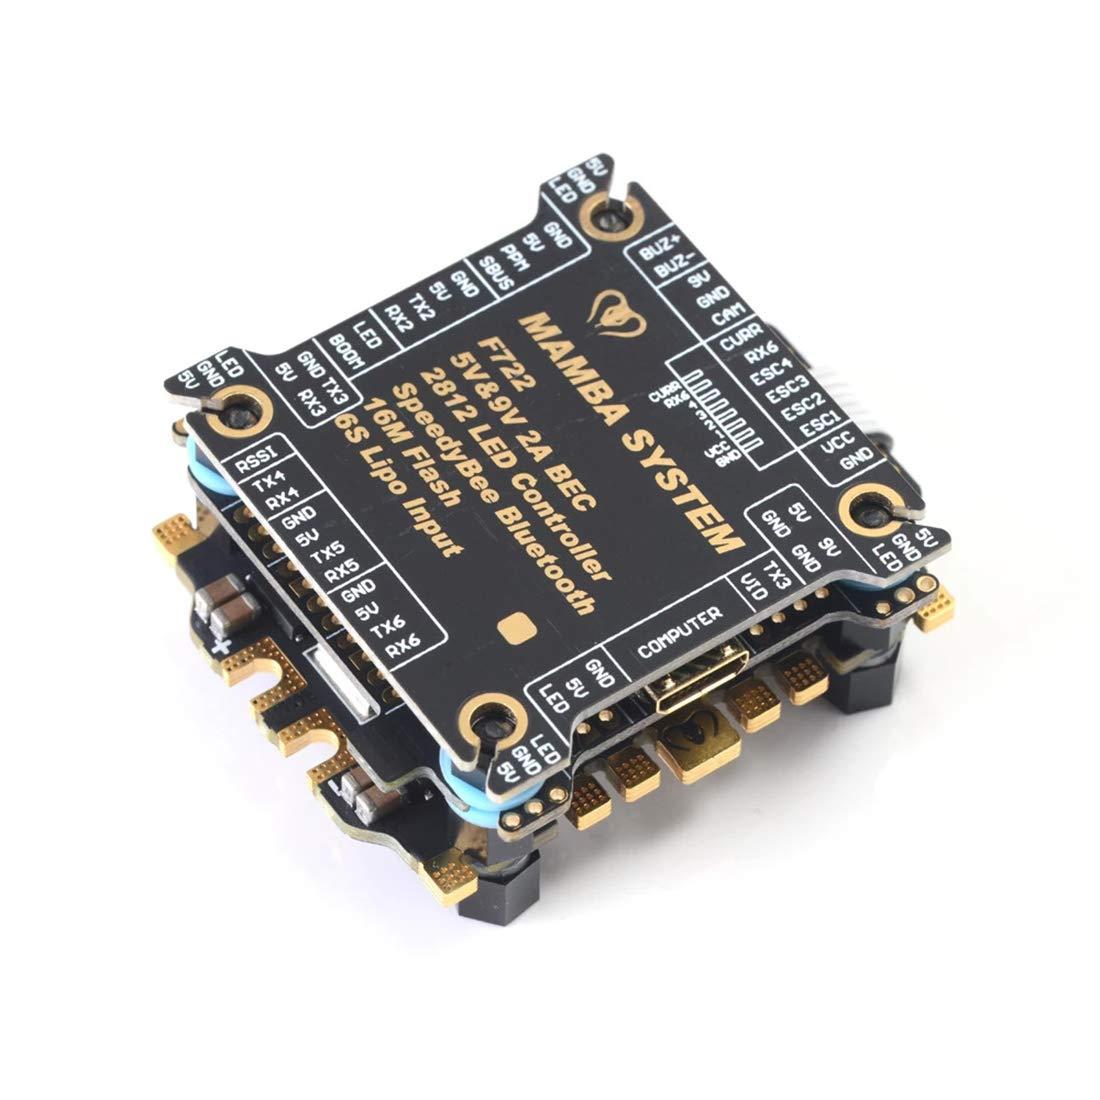 Wera 05118024001 2050 Elektroniker-Kreuzschlitzschraubendreher PH 1 x 80 mm /Ø 4.0